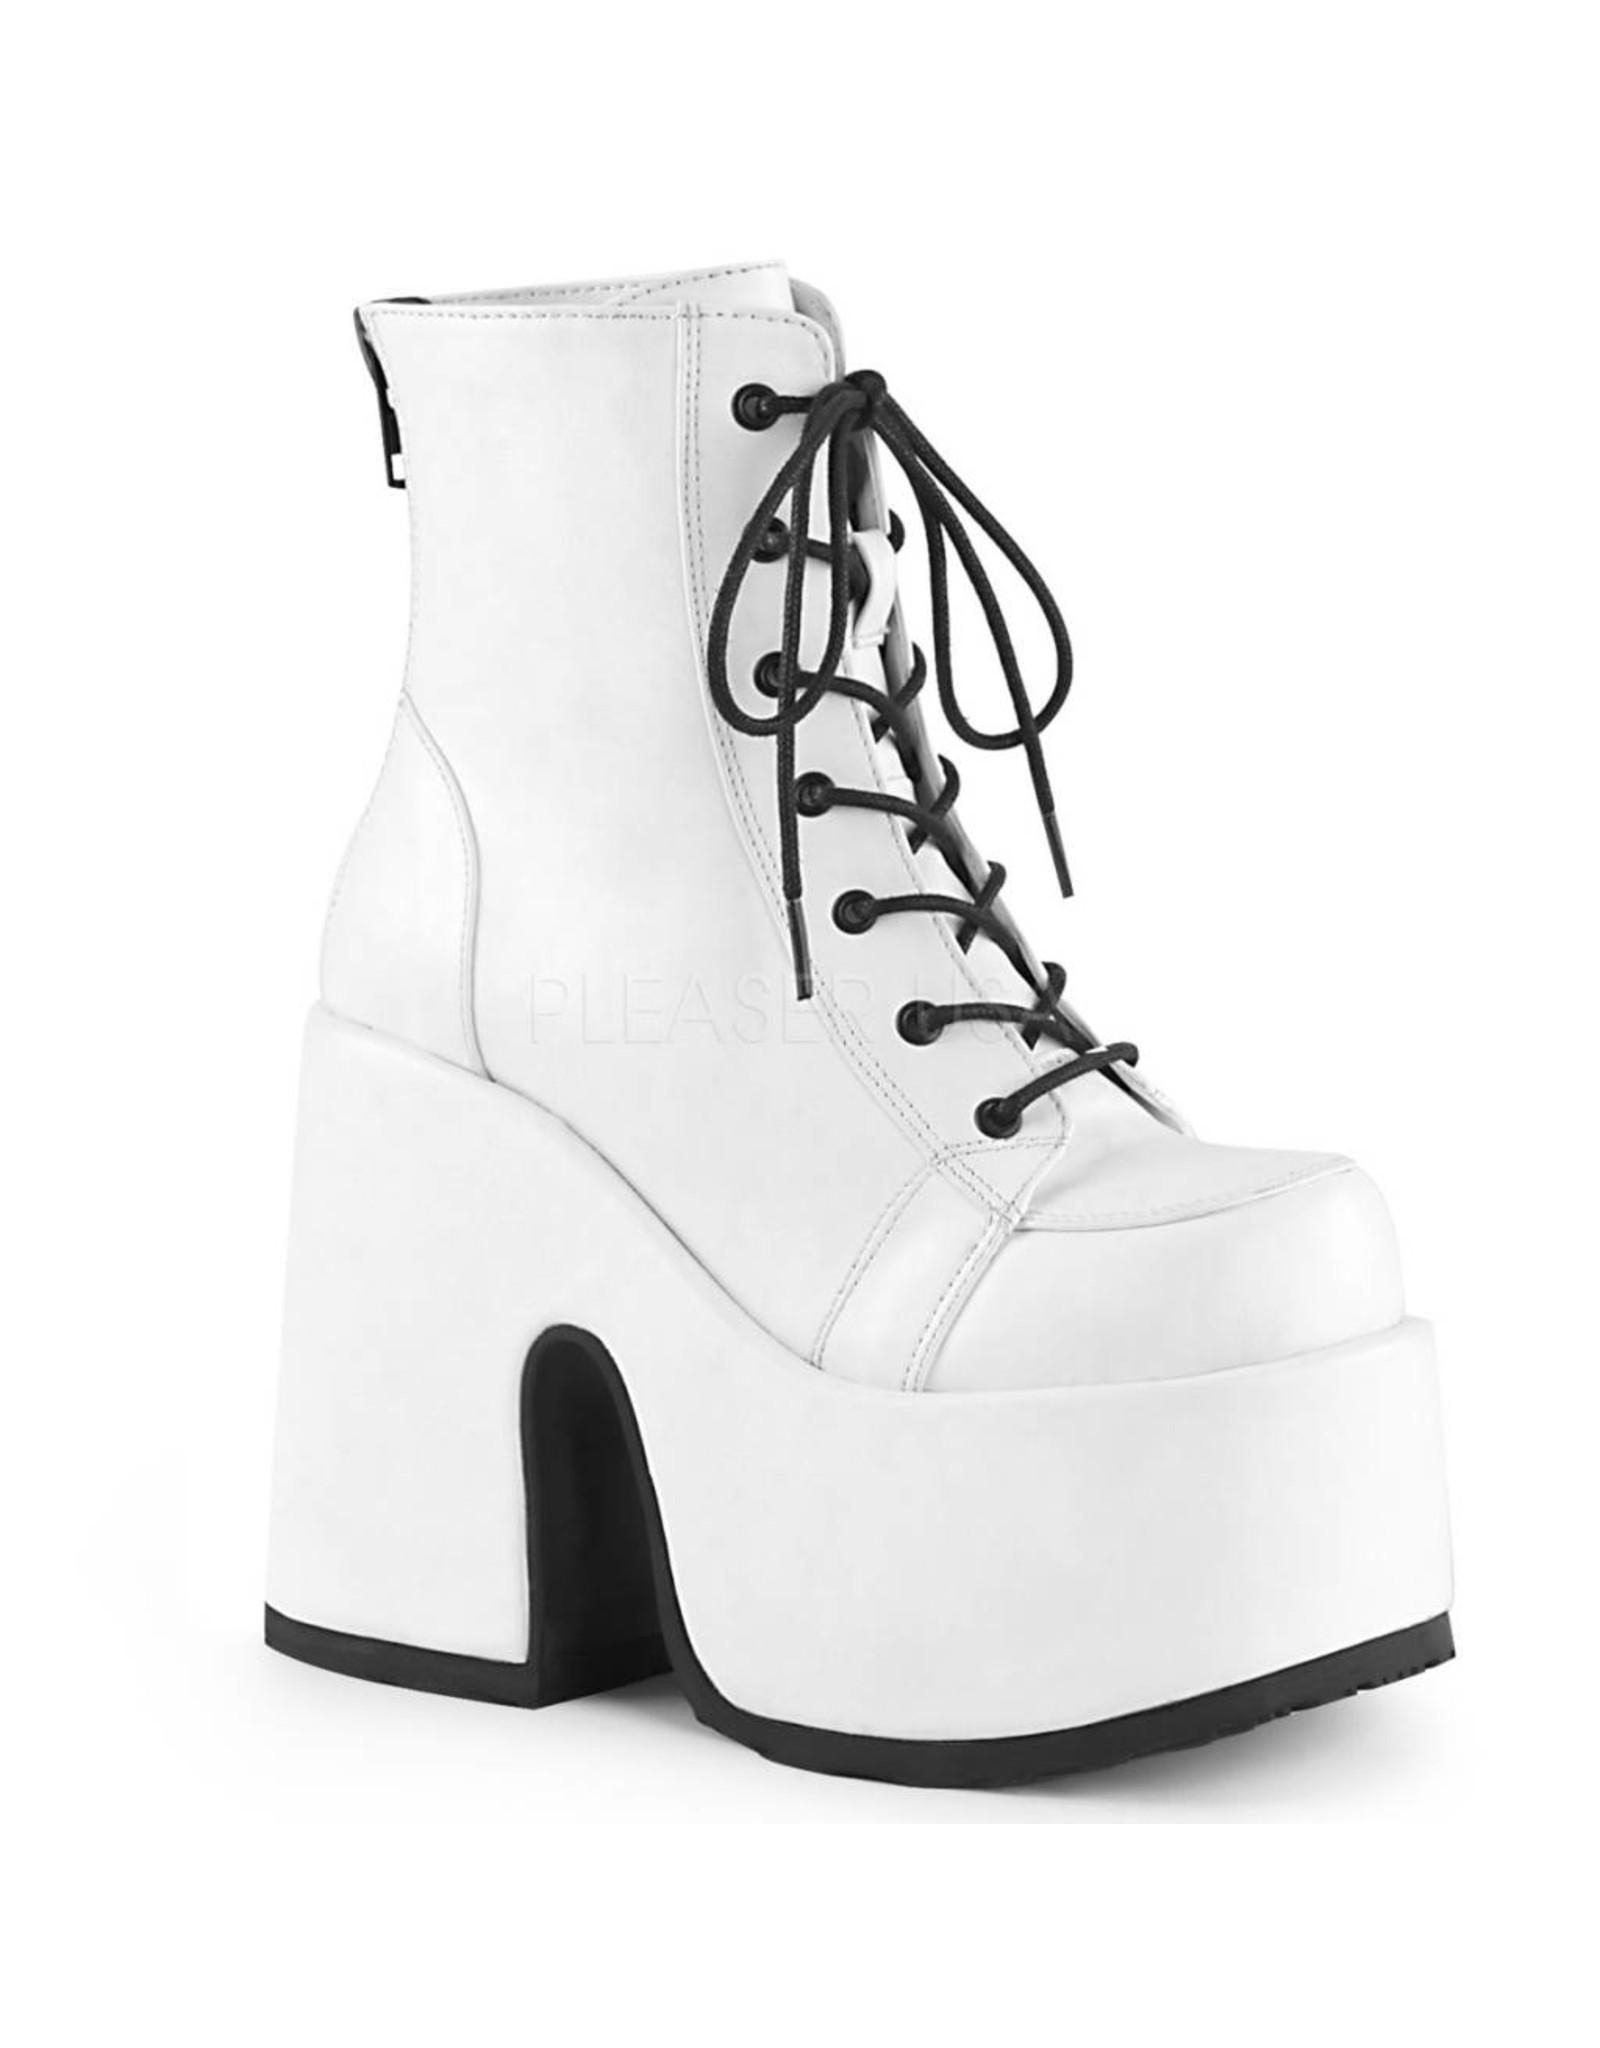 "DEMONIA CAMEL-203 5"" Chunky Heel, 3"" Platform White Vegan Leather Boot, Metal Back Zip Closure D23VW"